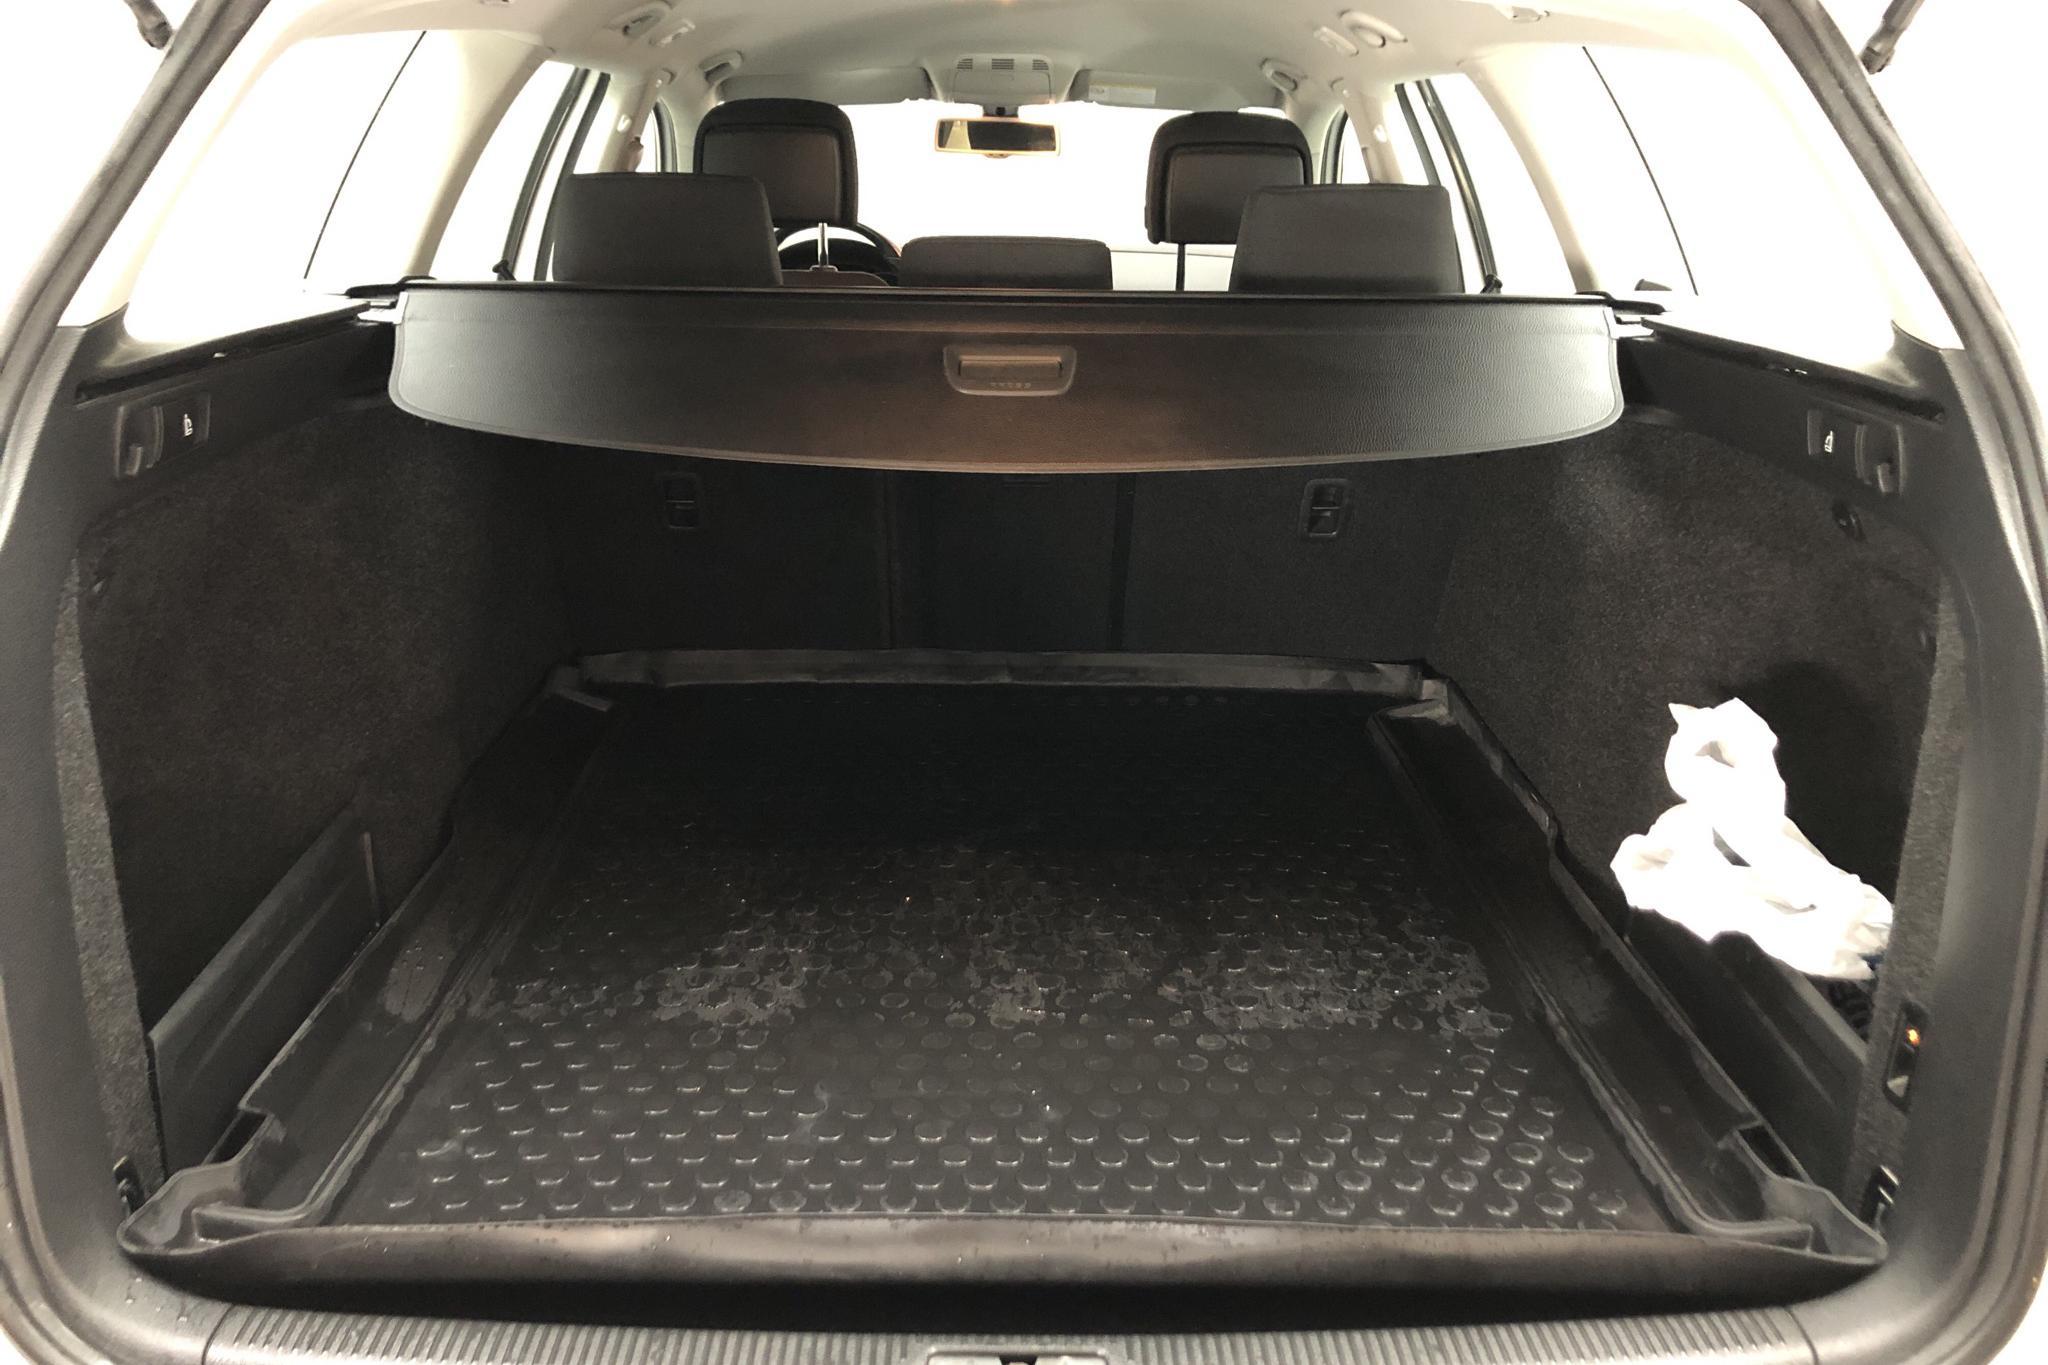 VW Passat 2.0 TDI BlueMotion Technology Variant (140hk) - 151 760 km - Manual - white - 2012